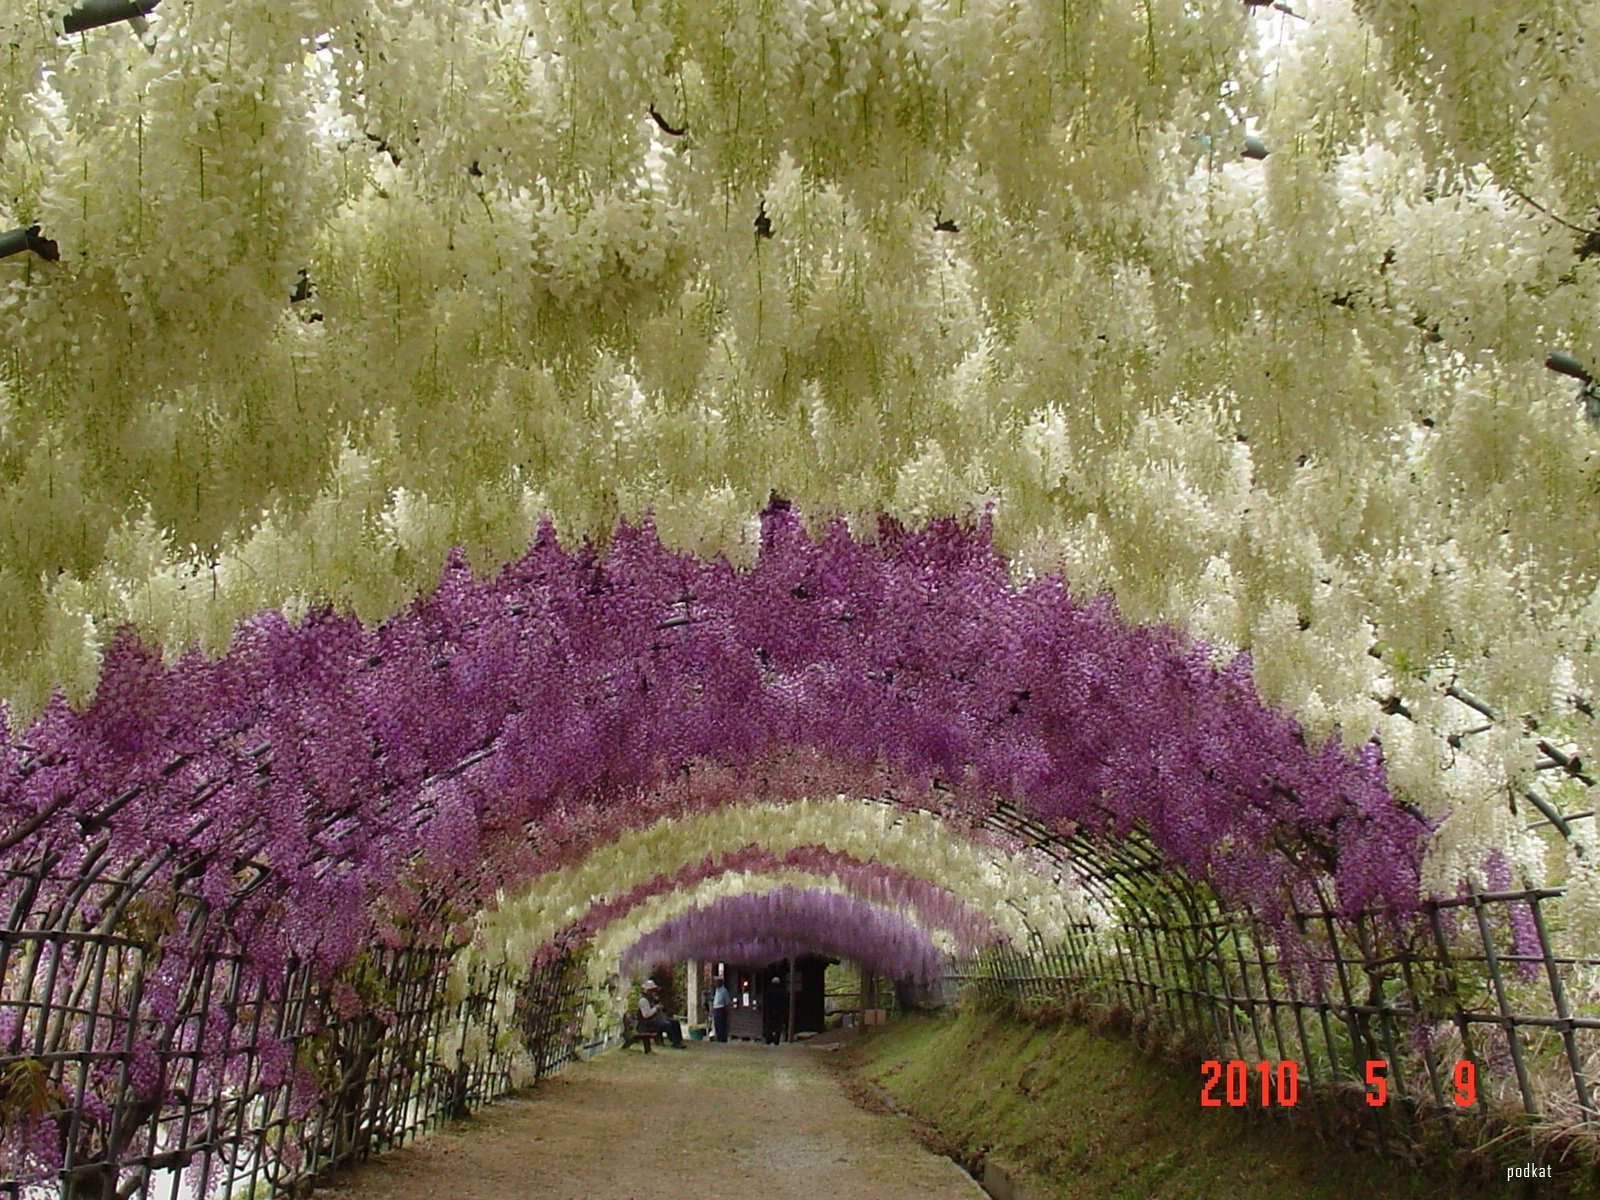 Fantastico tunel wisteria 7 pics ons ke for Jardines kawachi fuji